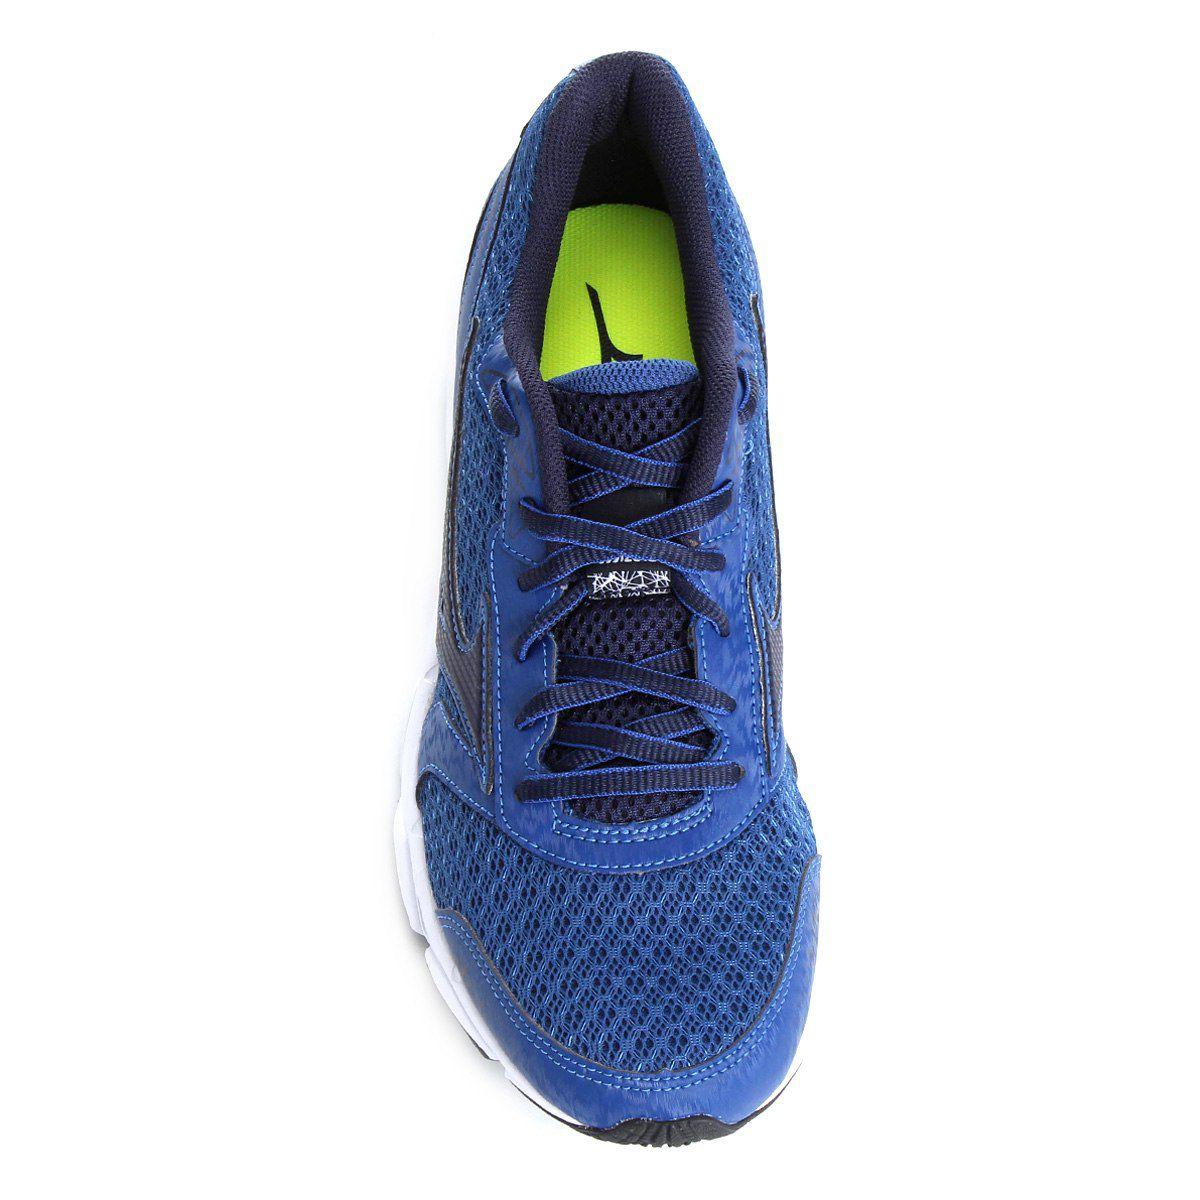 53096cff3 Tênis Mizuno Jet 2 N Masculino - Azul e Branco - Linha Esporte